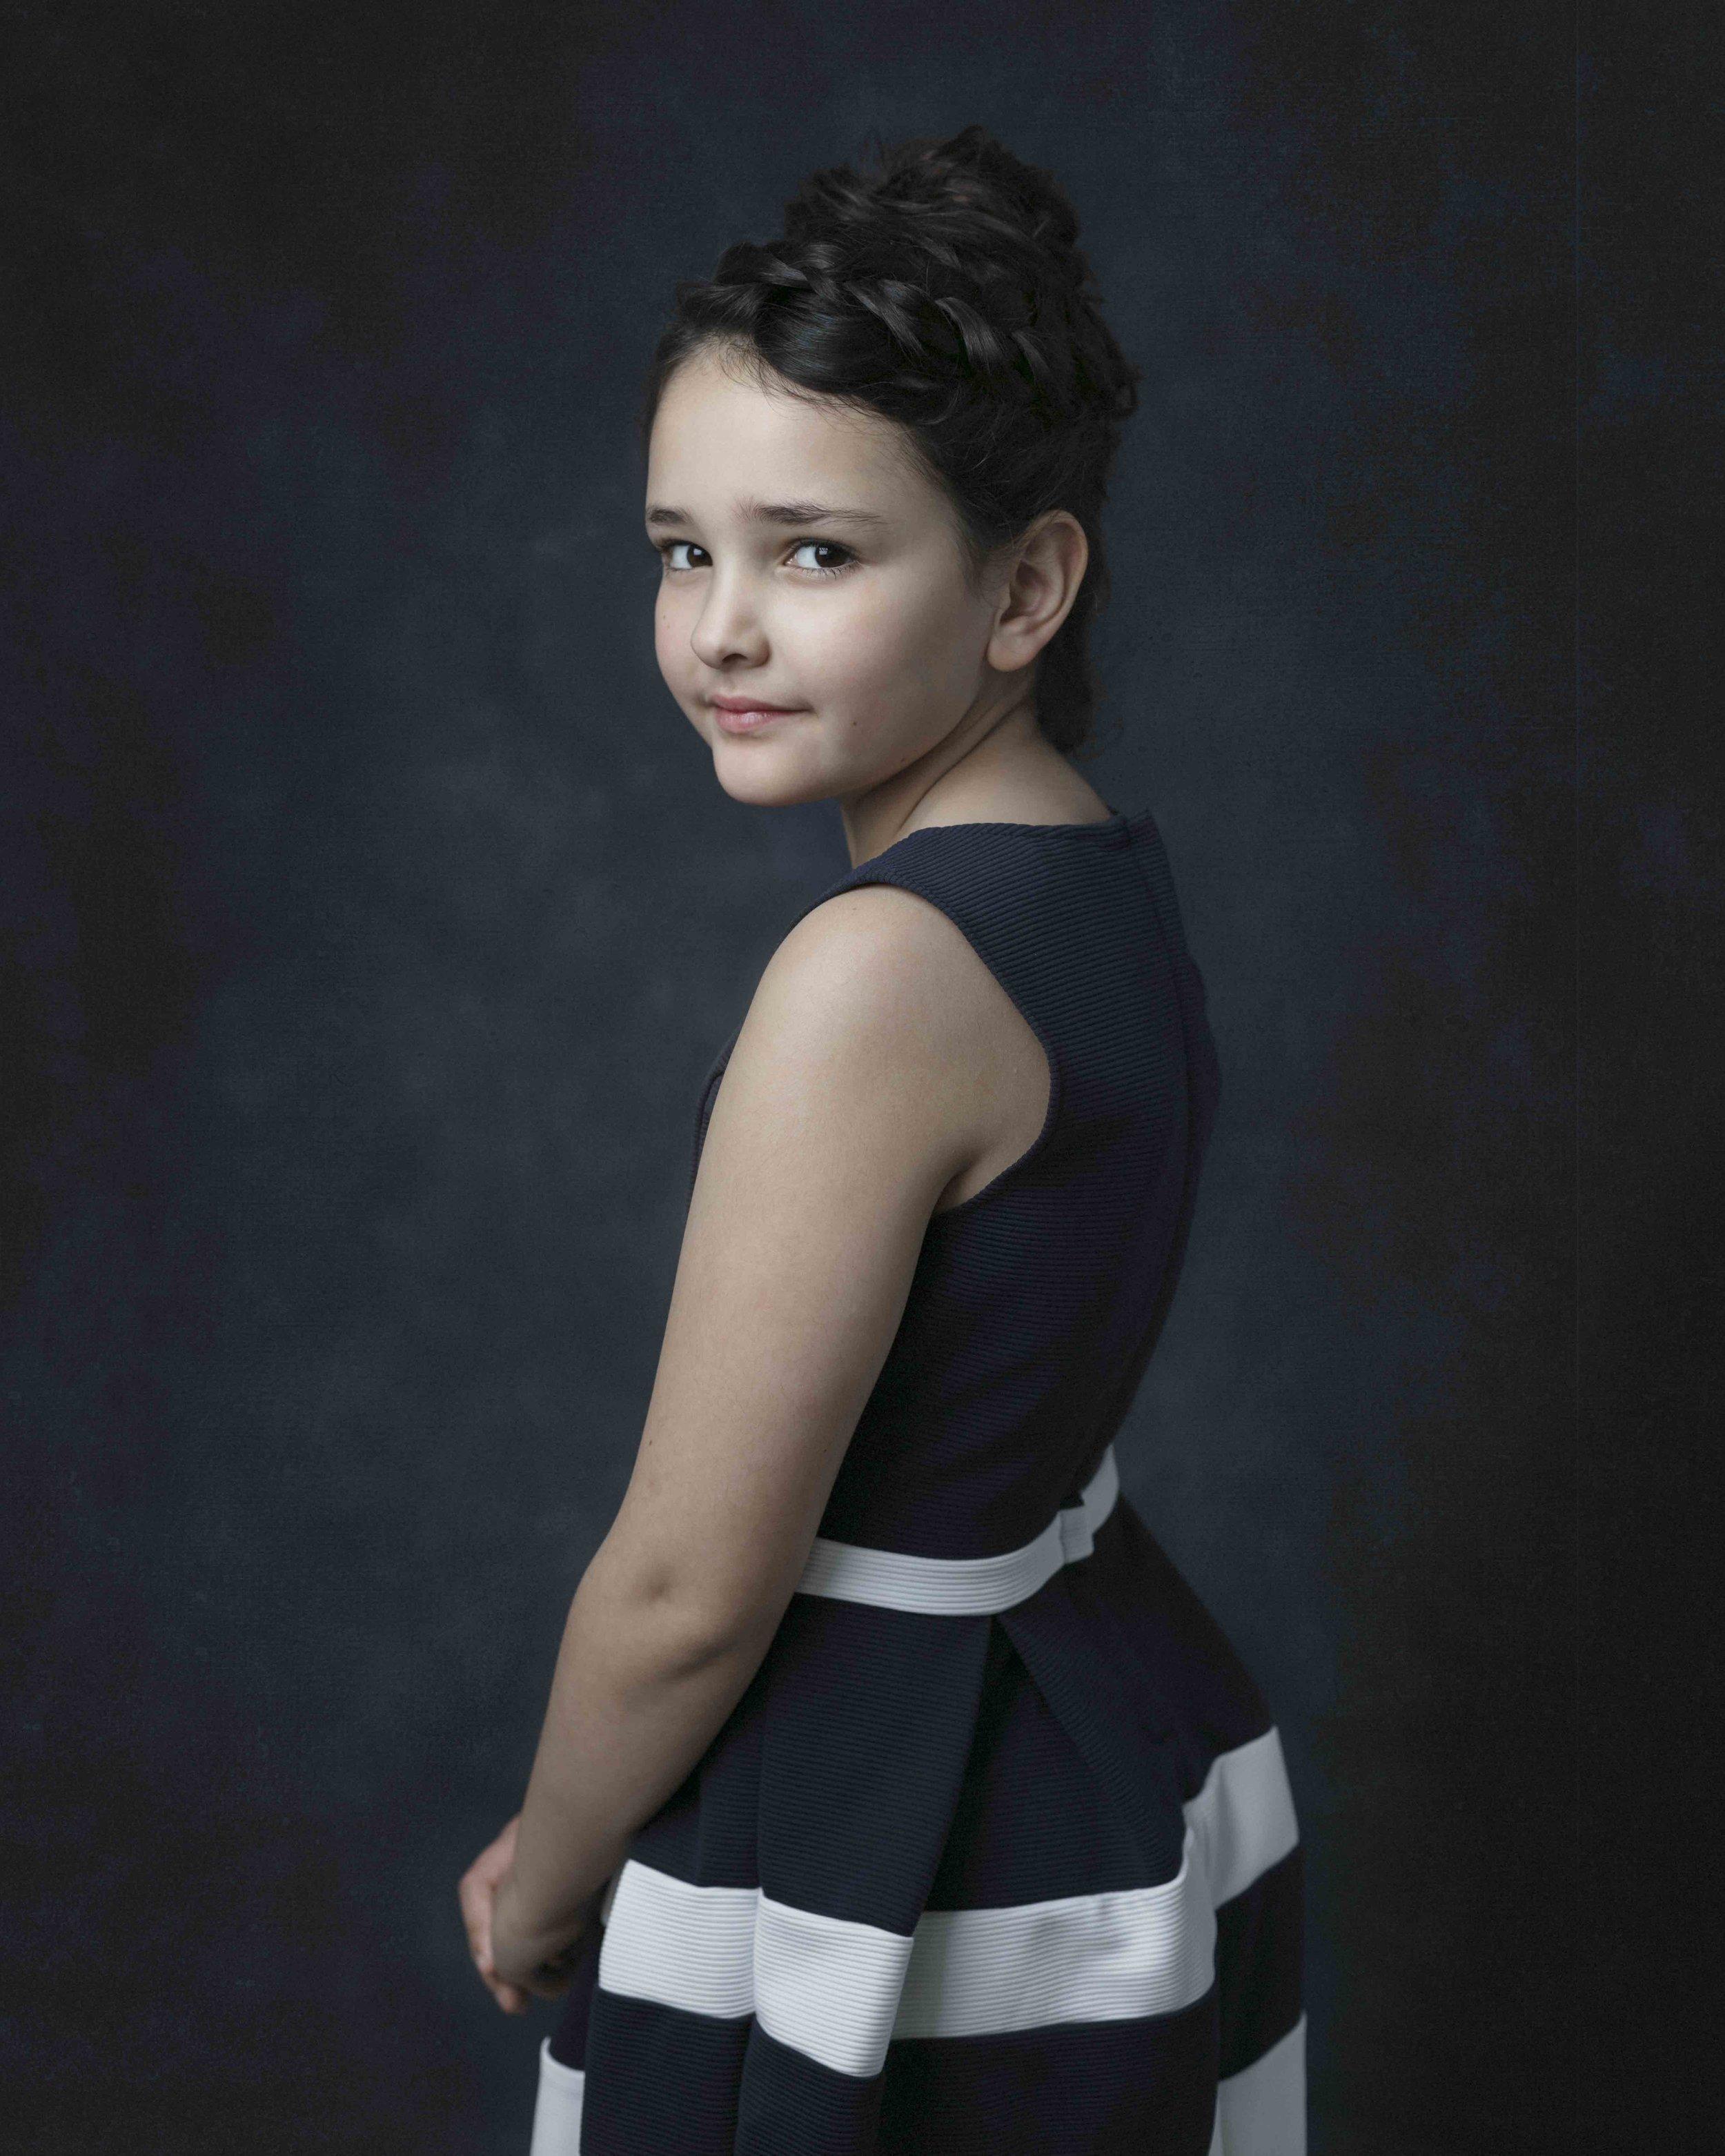 marina-mcdonald-child-portrait-photography-portfolio-canberra-child-french-dress